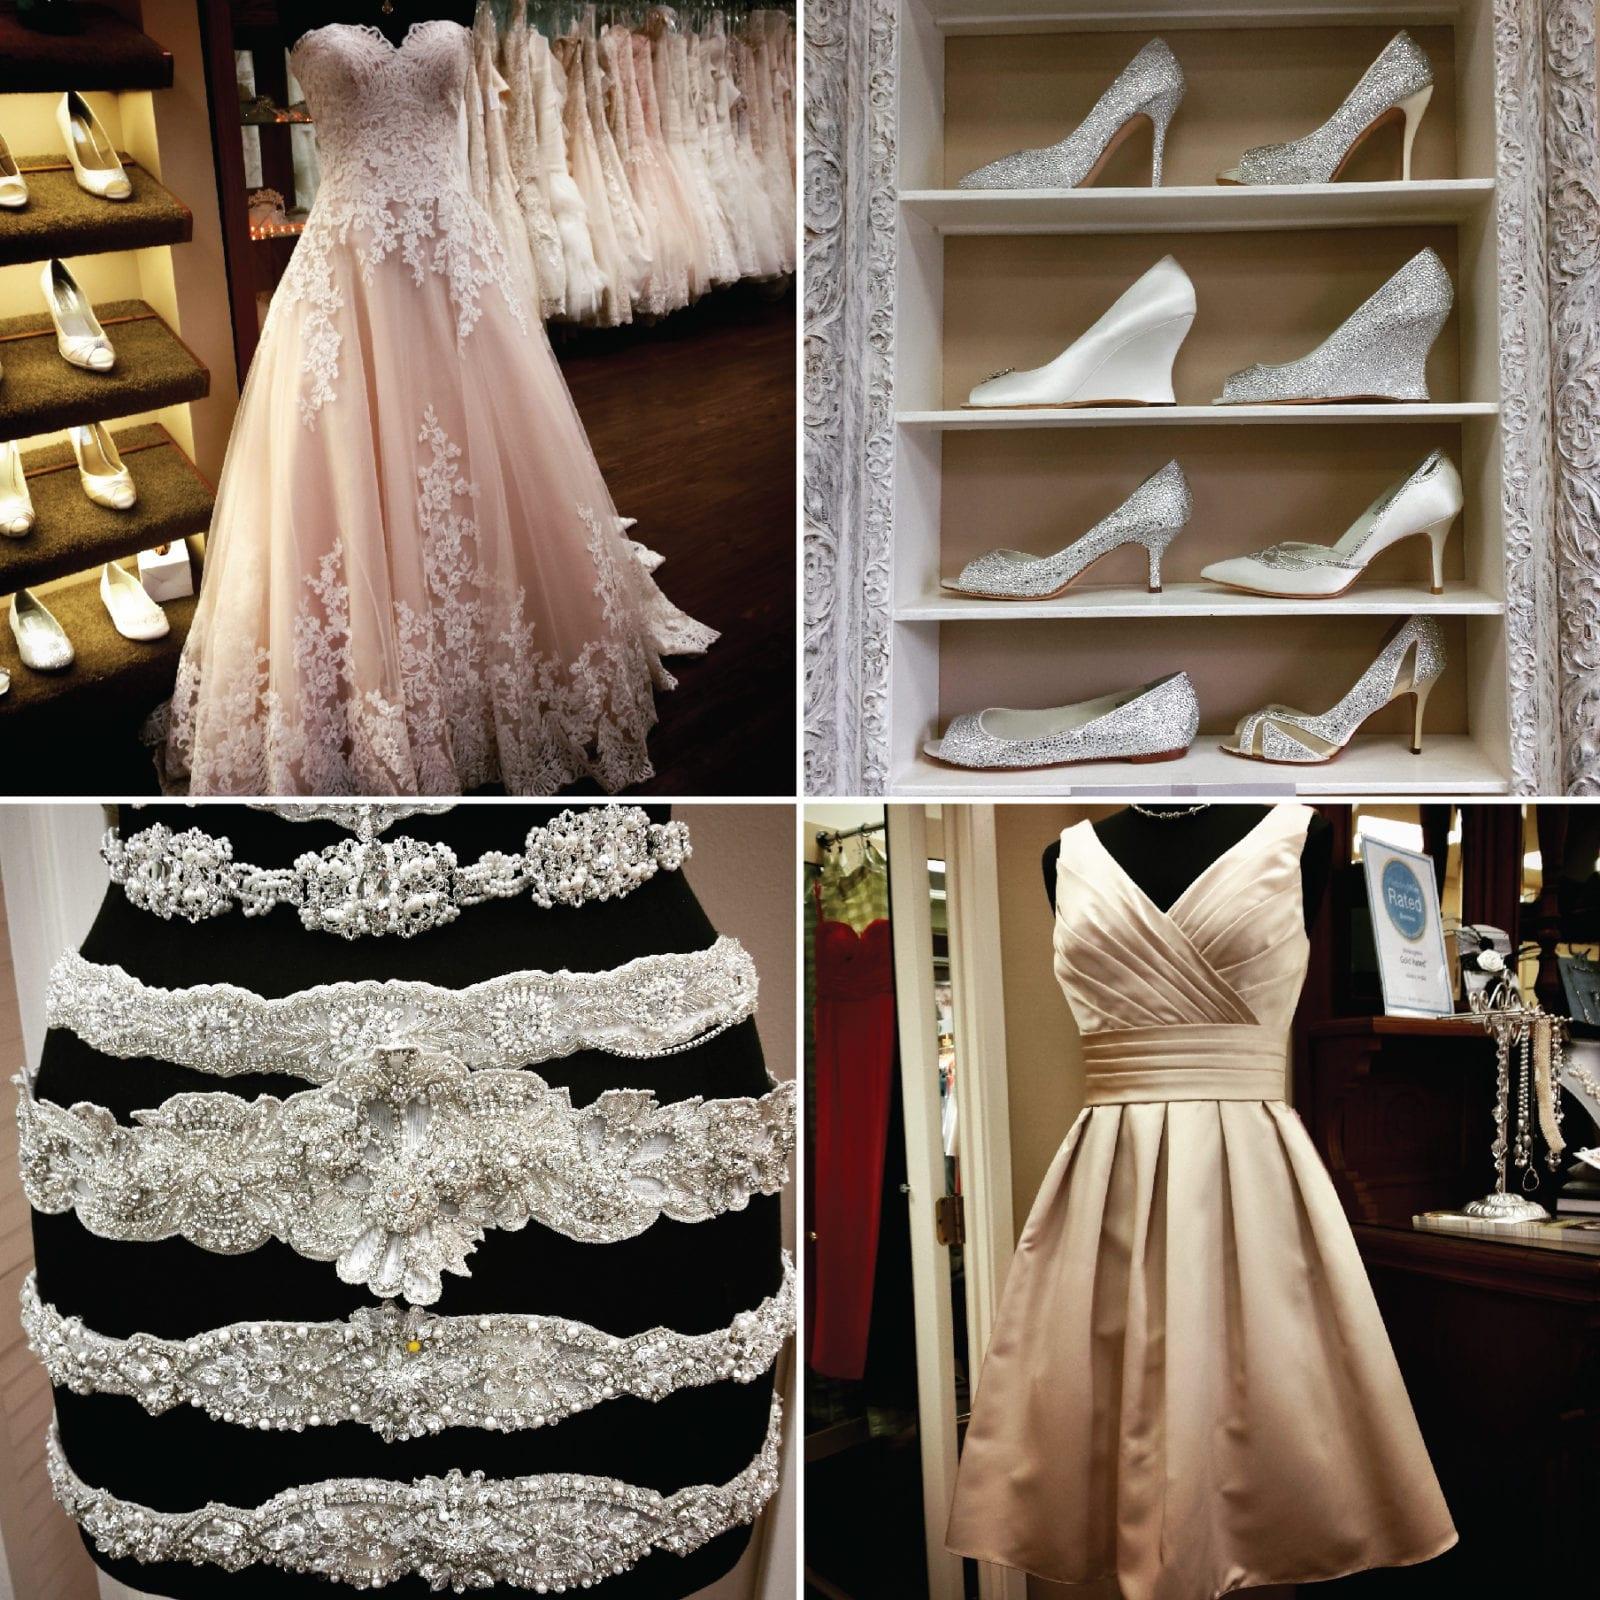 Bellingham, Bridal Shop, Alicia's Bridal, Tuxedos, The Formal House